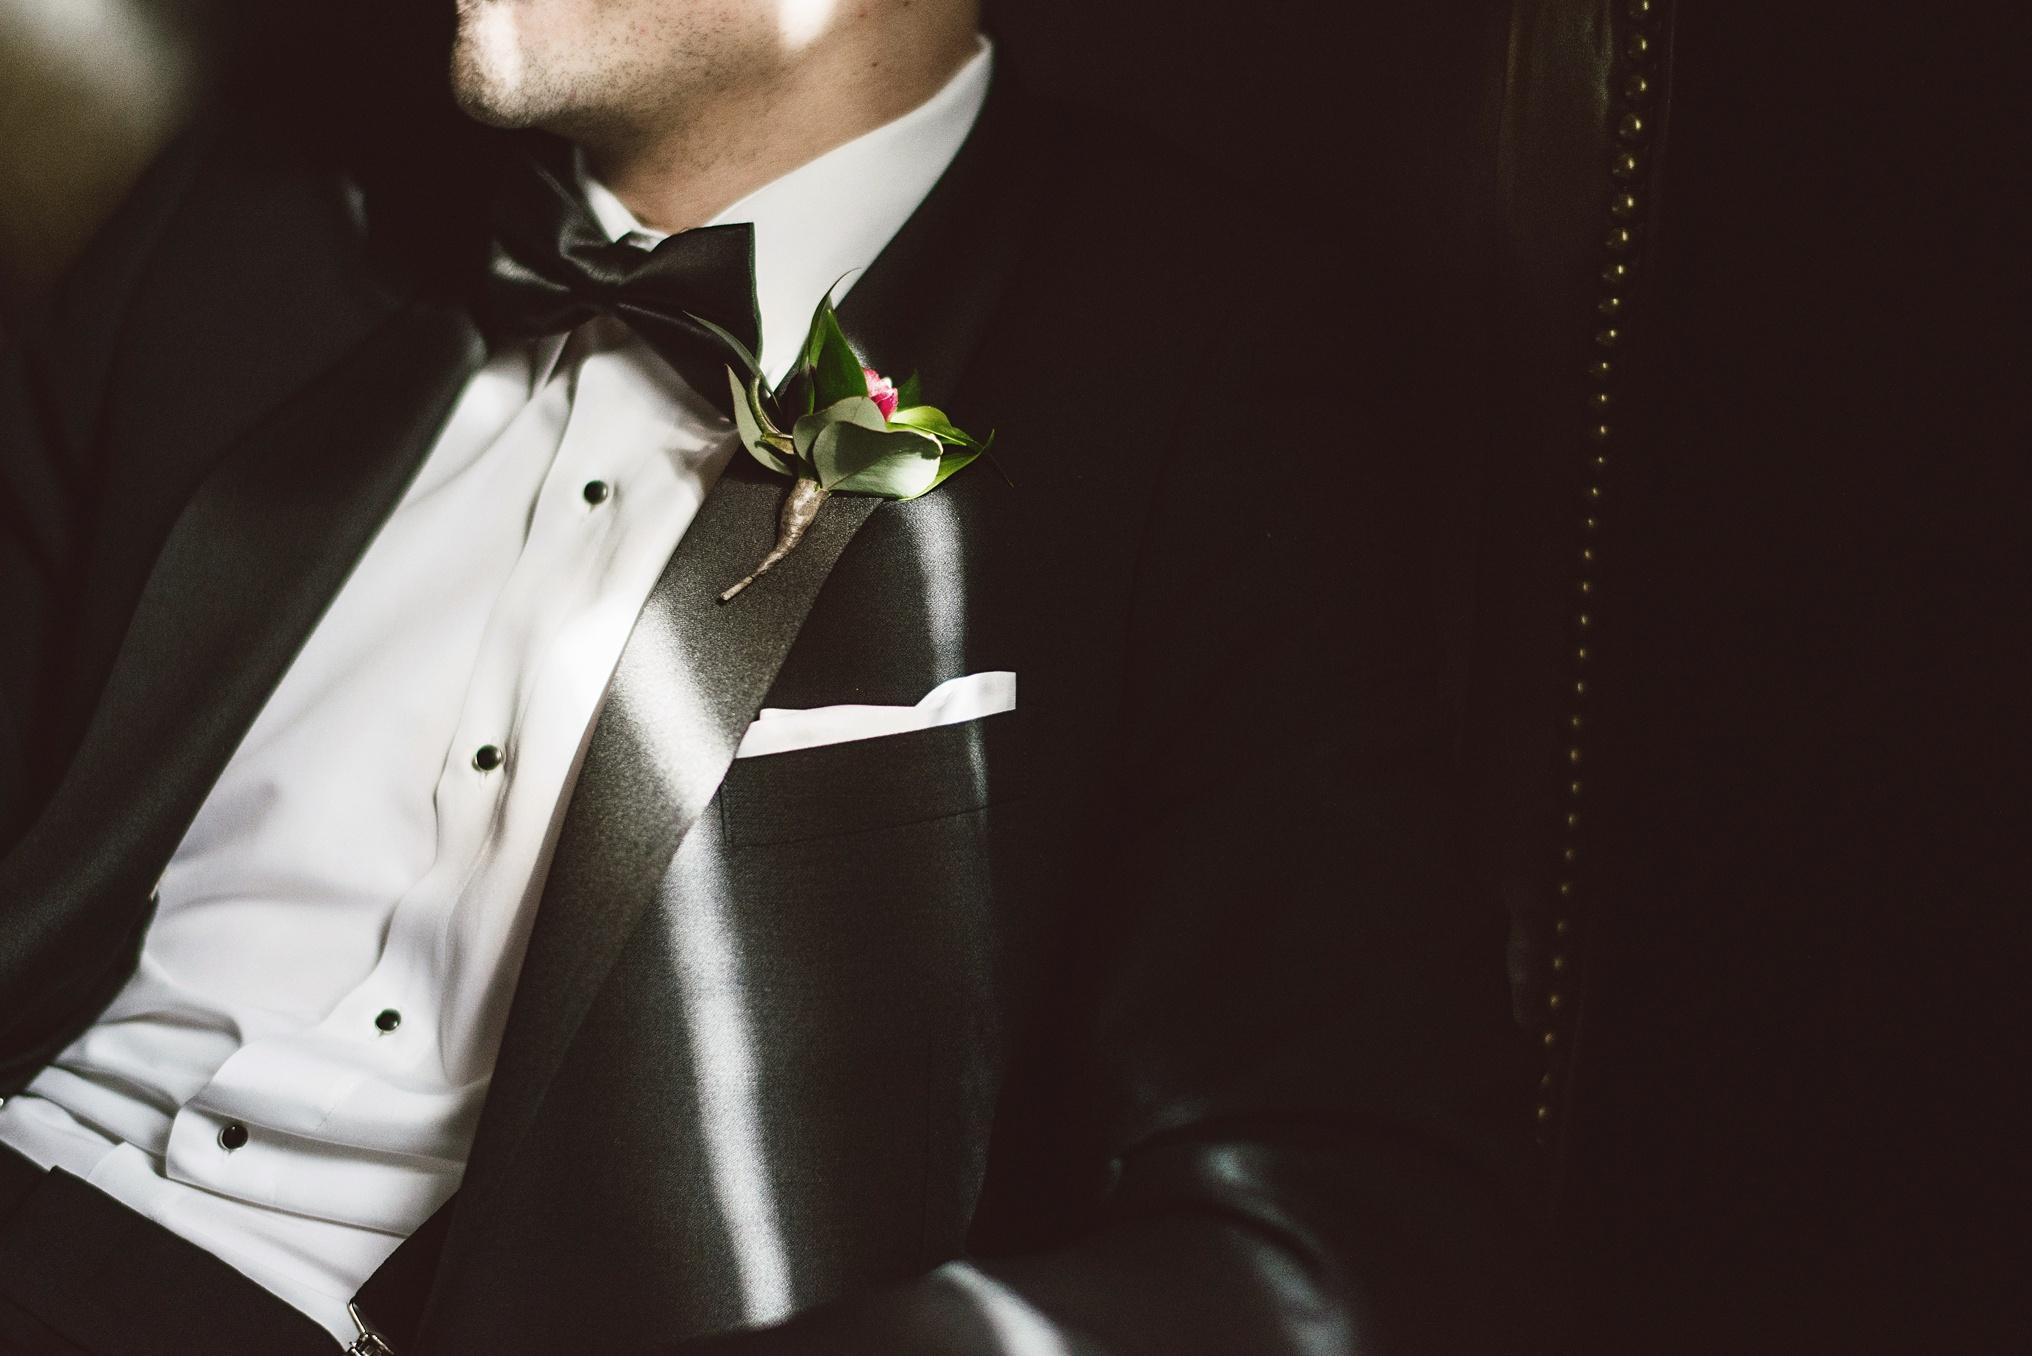 best_wedding_photography_2017_by_lucas_botz_photography_008.jpg